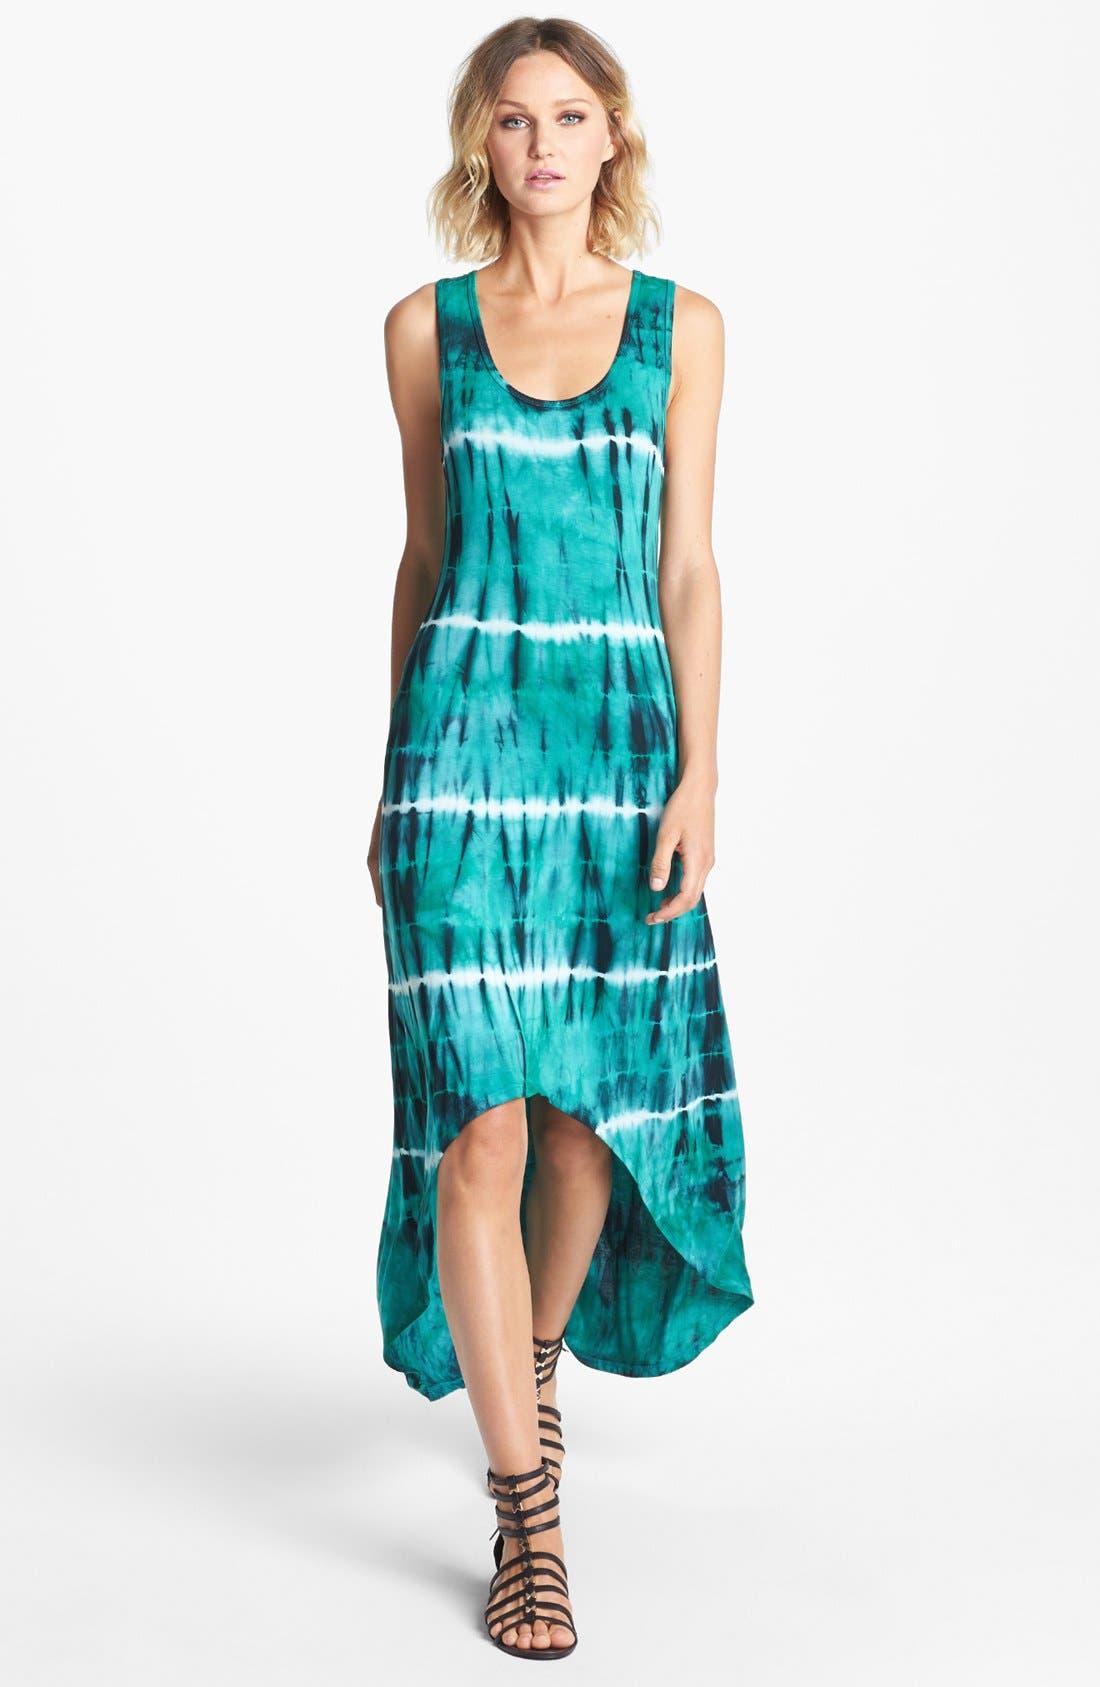 Main Image - Felicity & Coco 'Ivy' Tie Dye Maxi Dress (Nordstrom Exclusive)